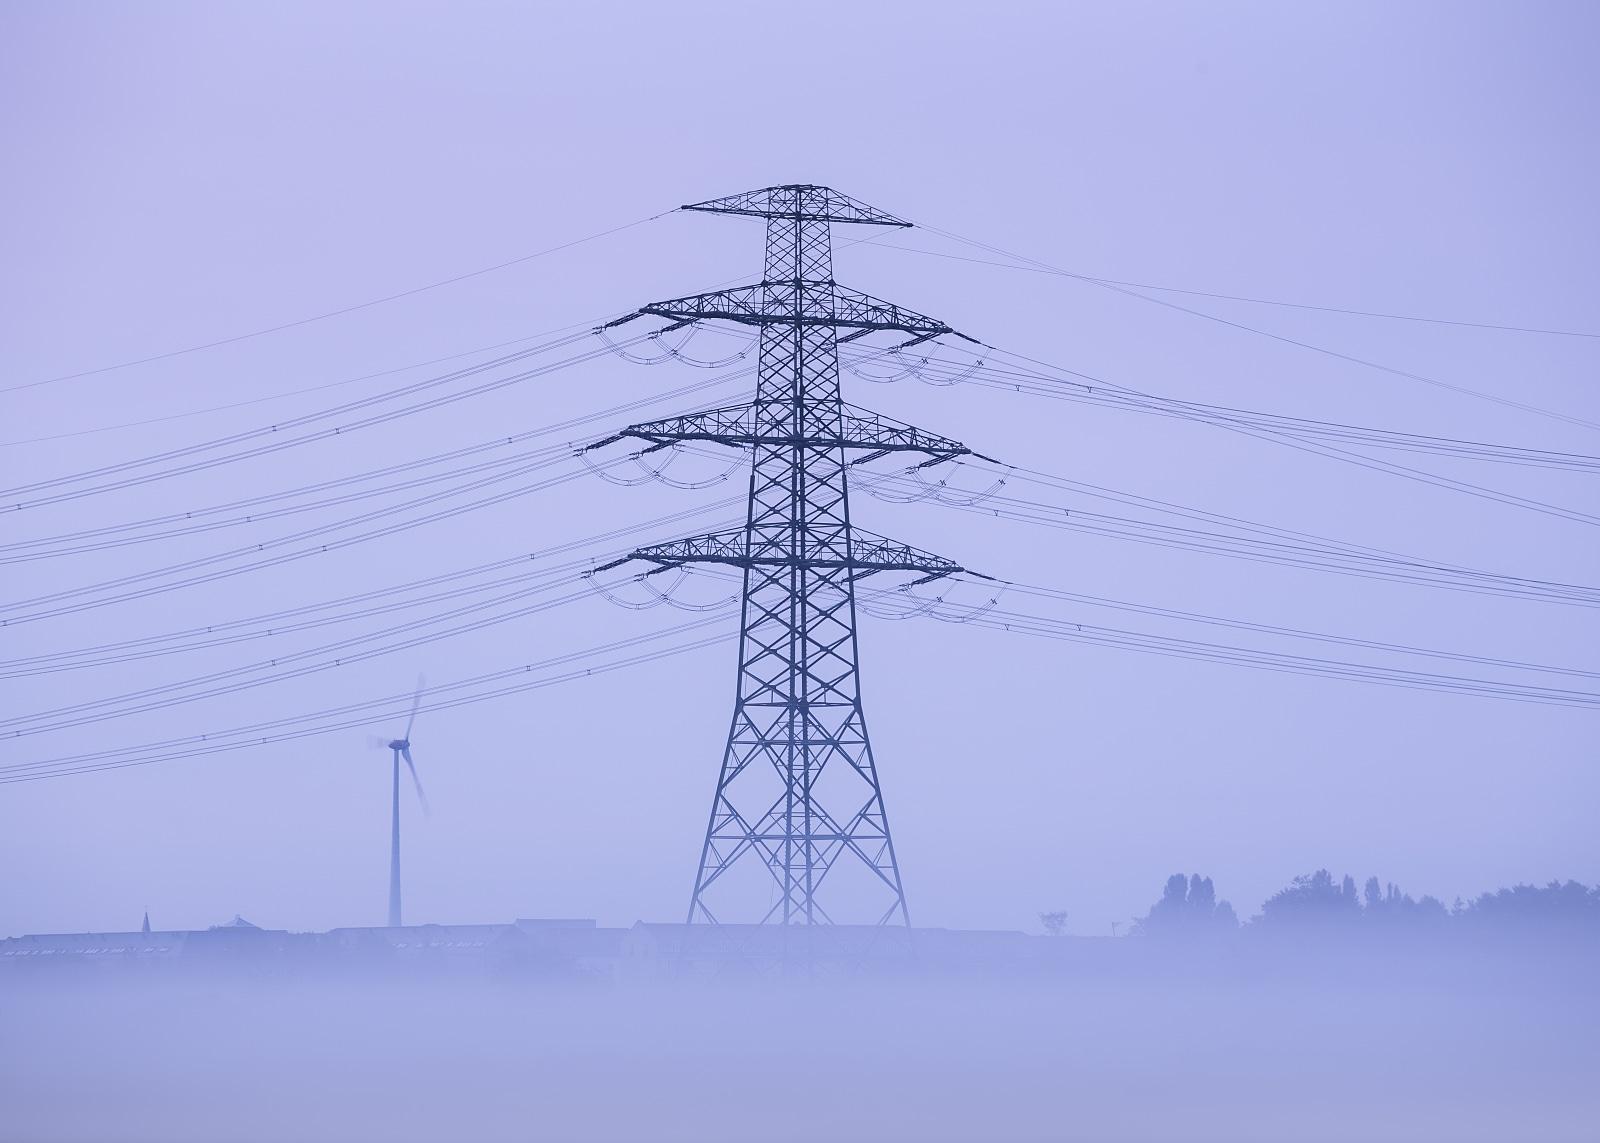 Power transmission tower in morning fog